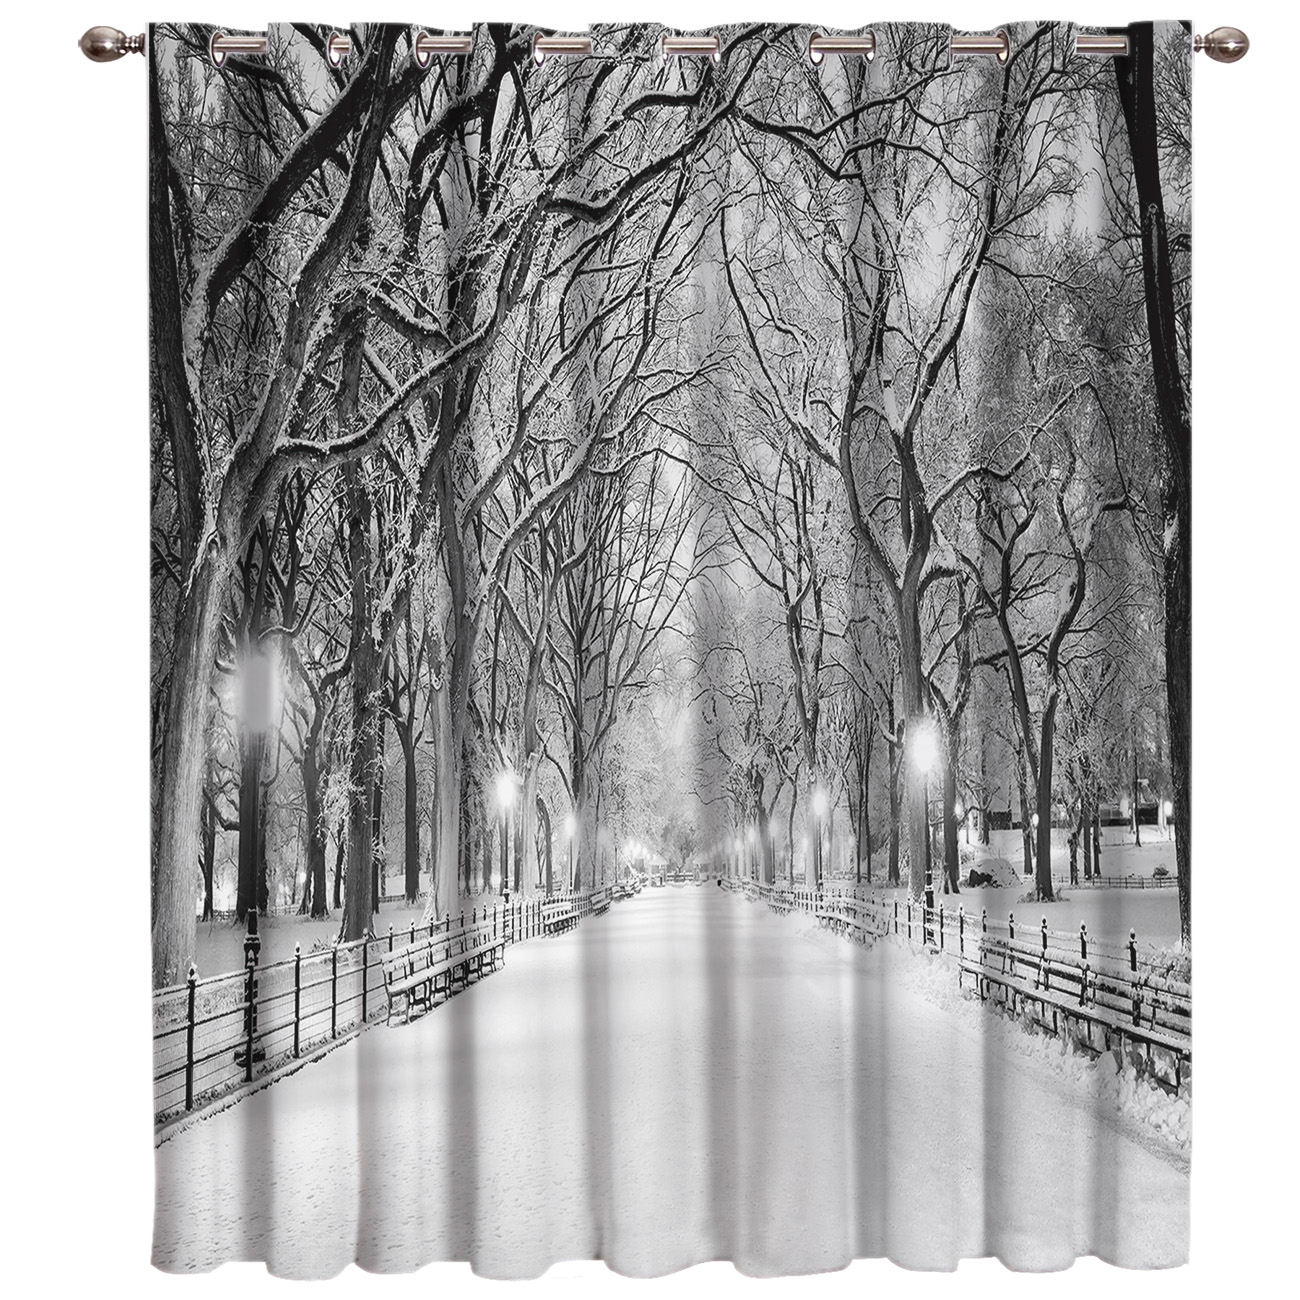 Winter Snow Season Street Room Curtains Large Window Window Curtains Dark Living Room Outdoor Fabric Indoor Curtain Panels With